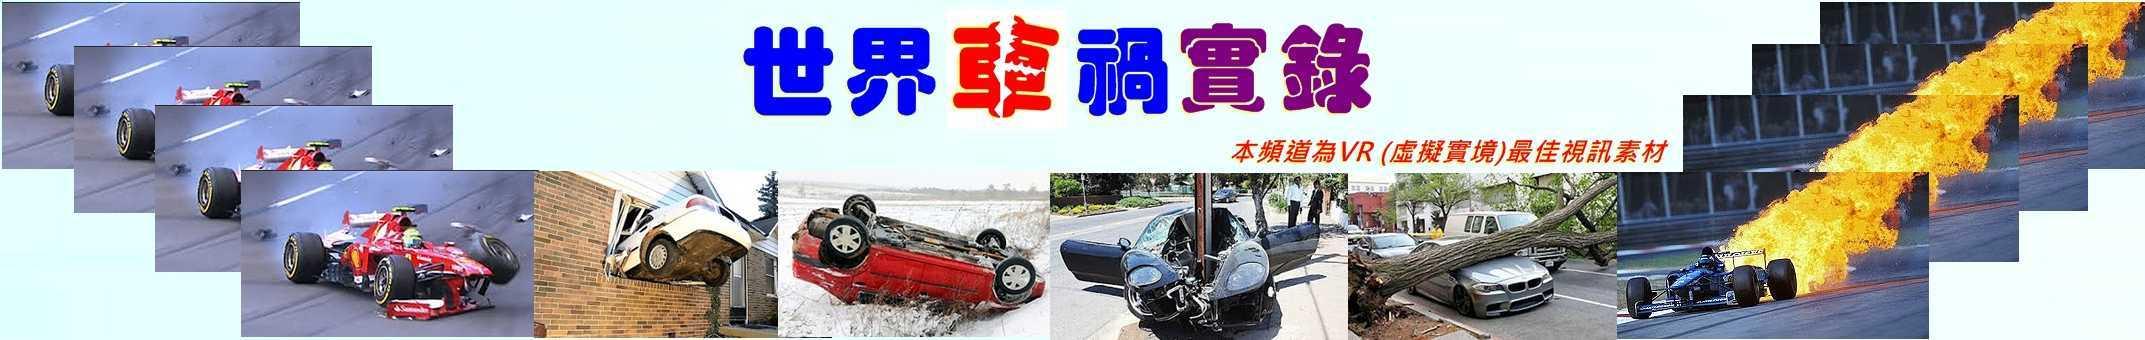 世界車禍实录 banner